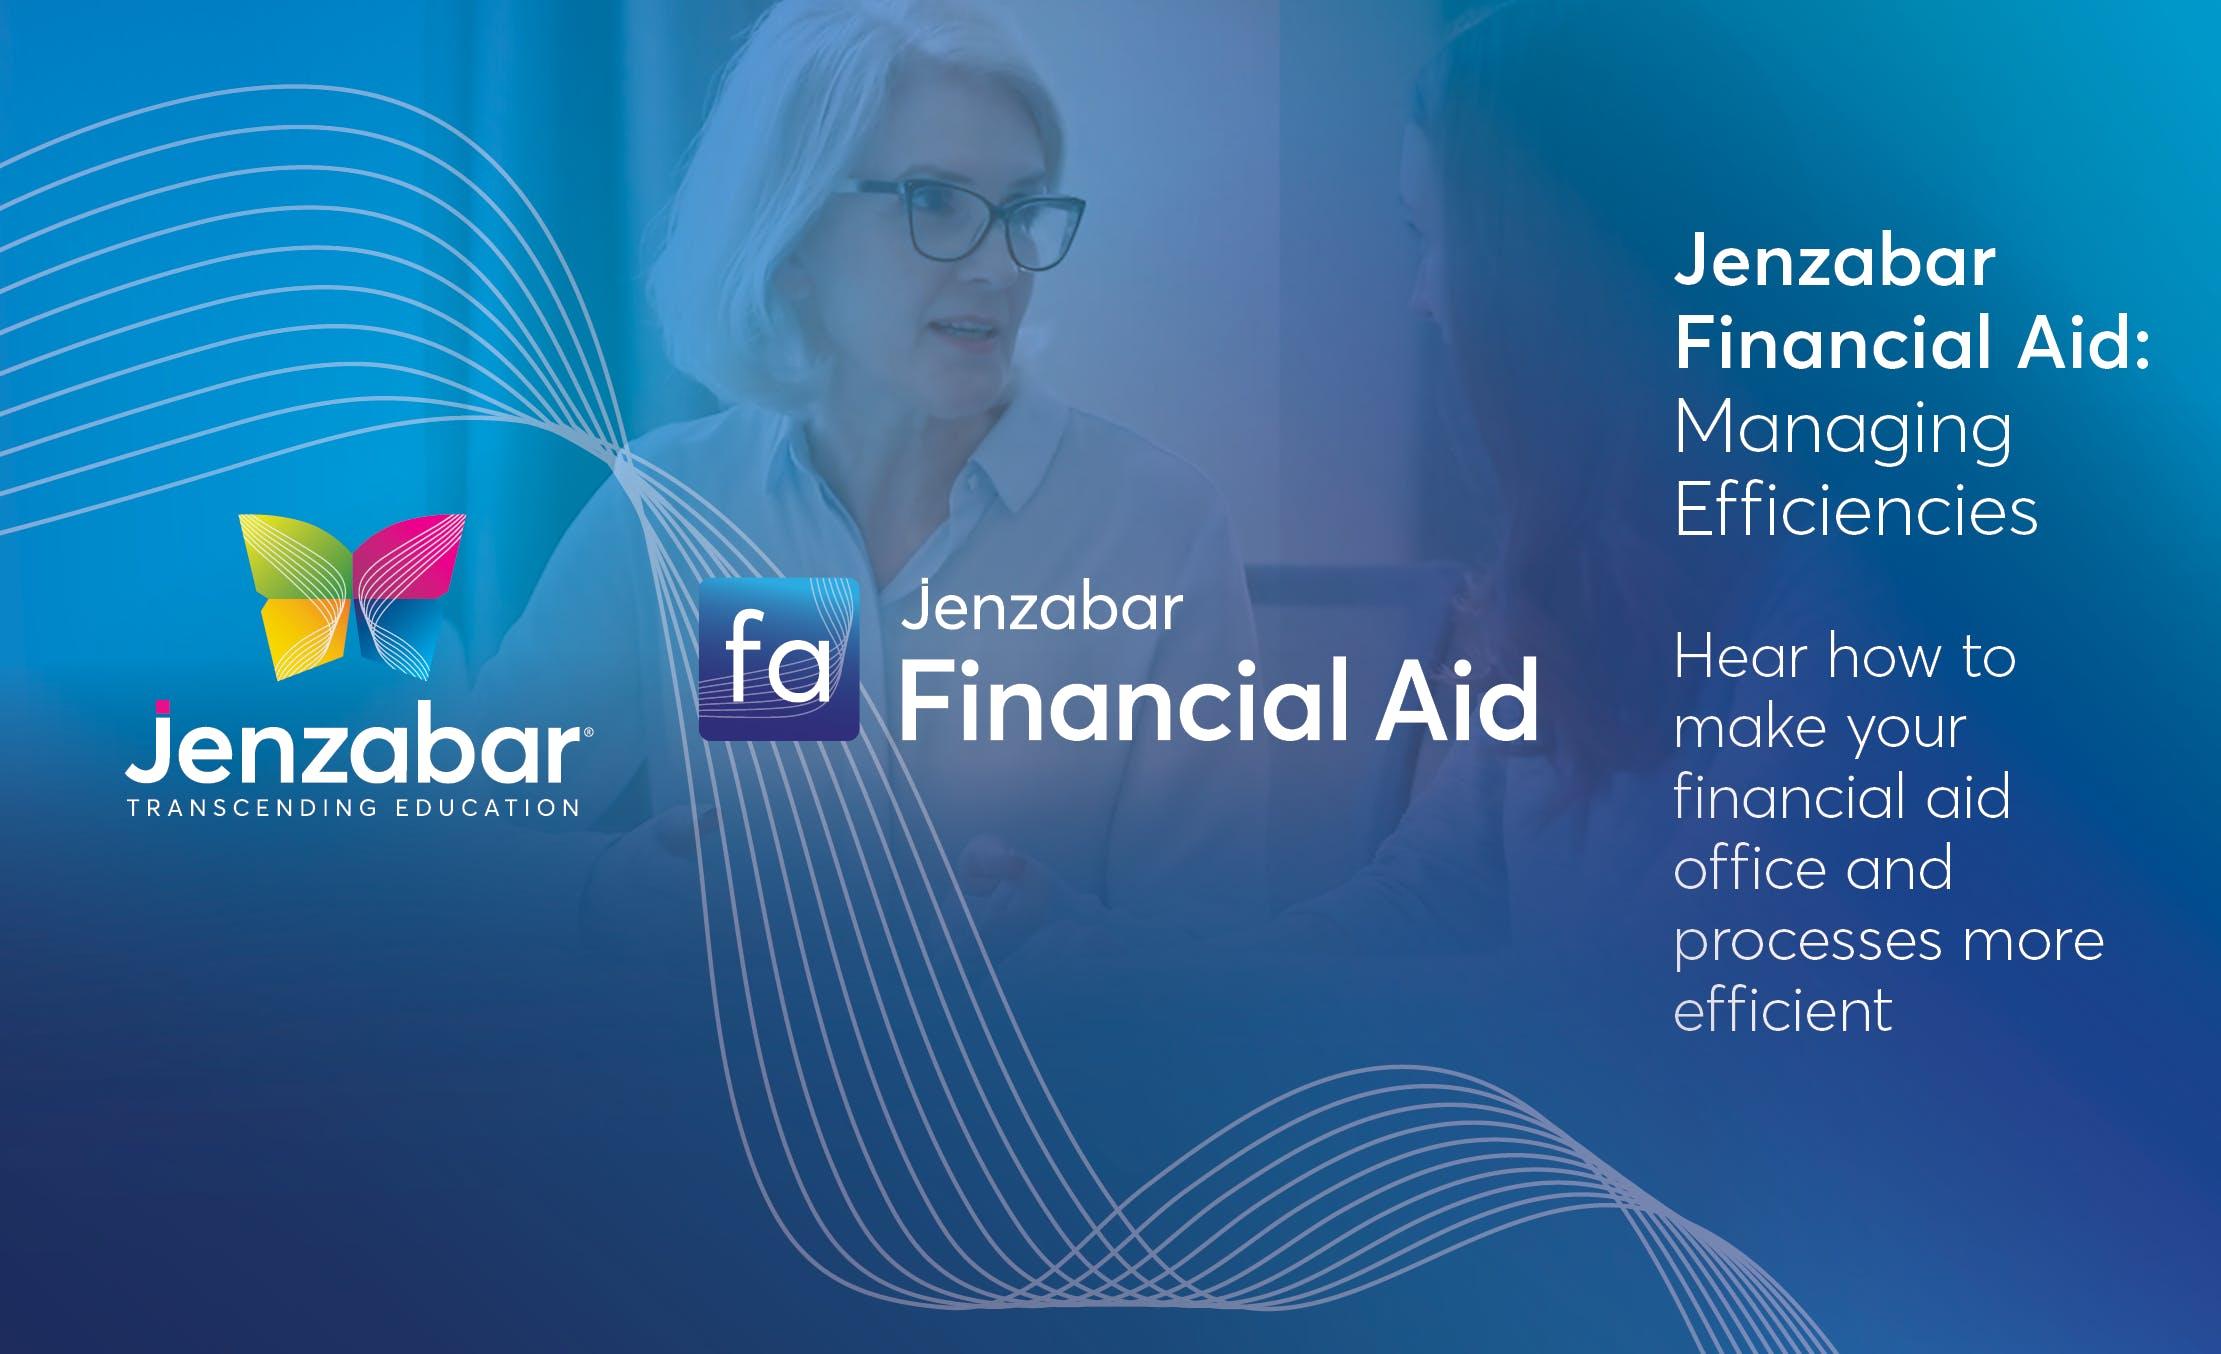 Jenzabar Financial Aid: Managing Efficiencies